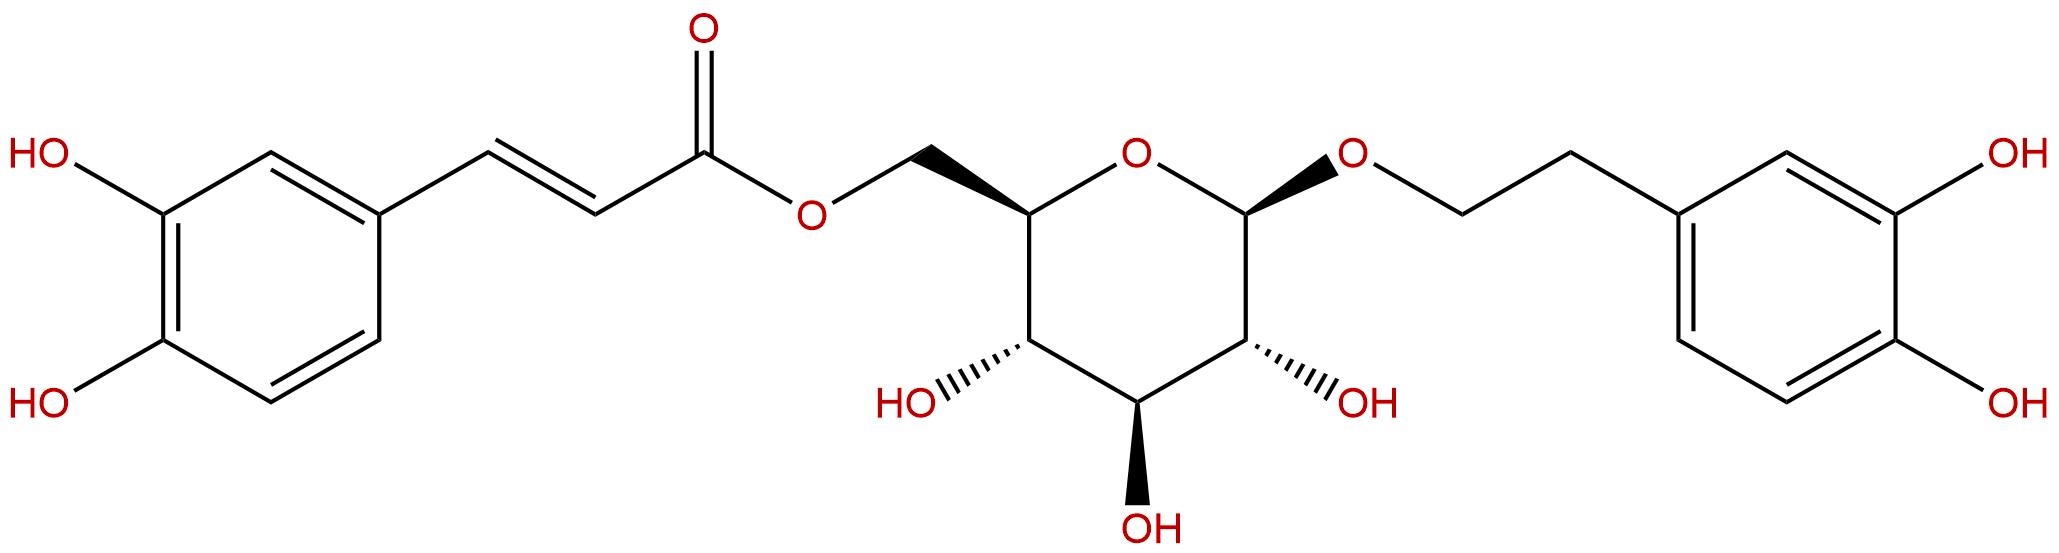 Calceolarioside B